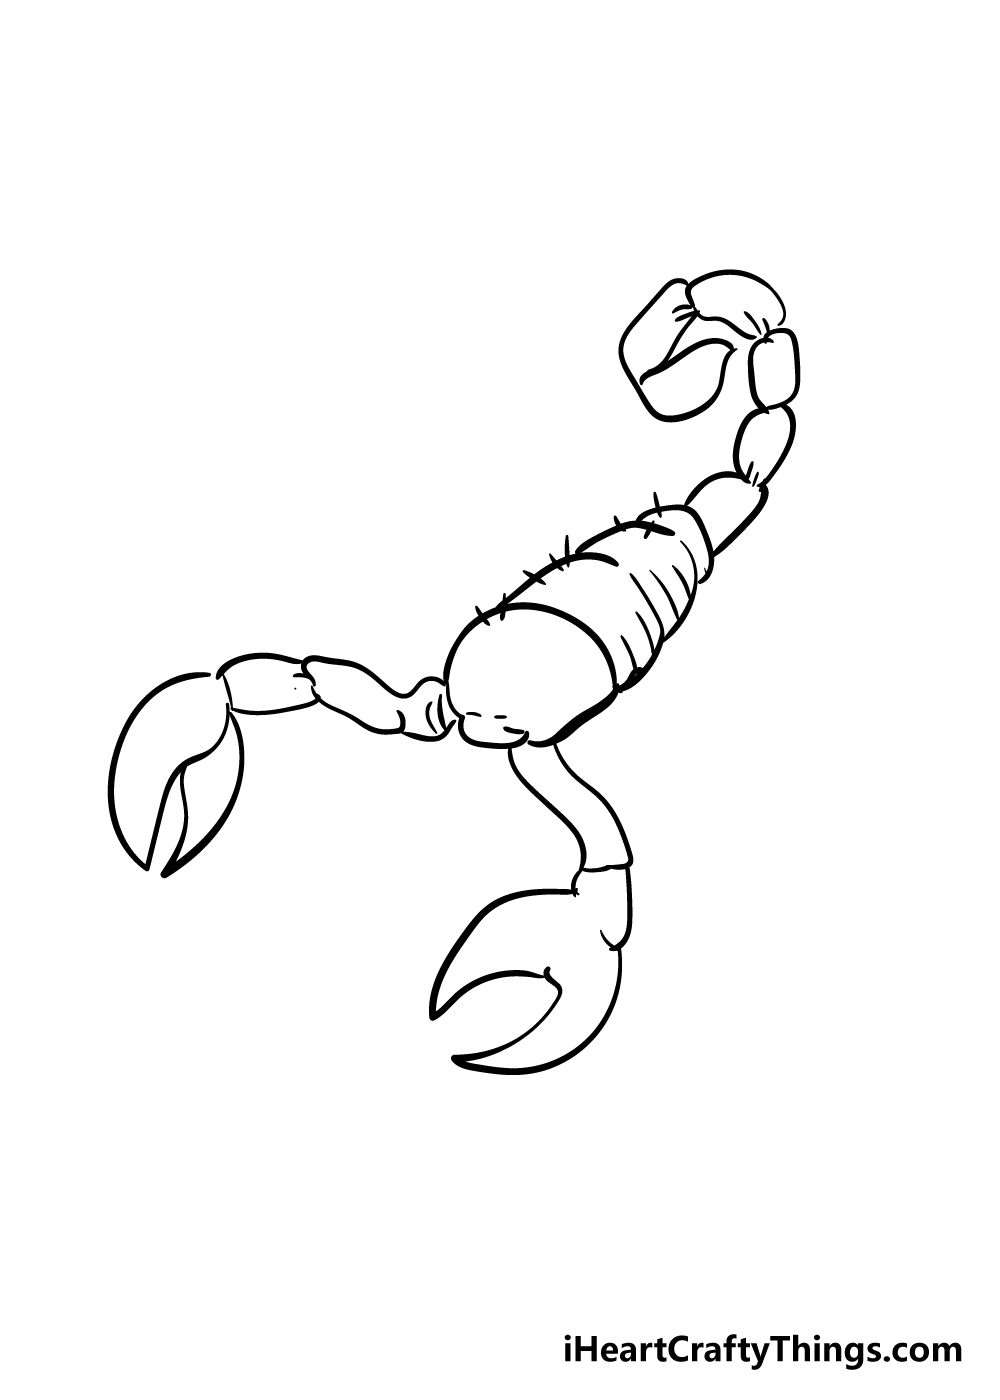 scorpion drawing step 4